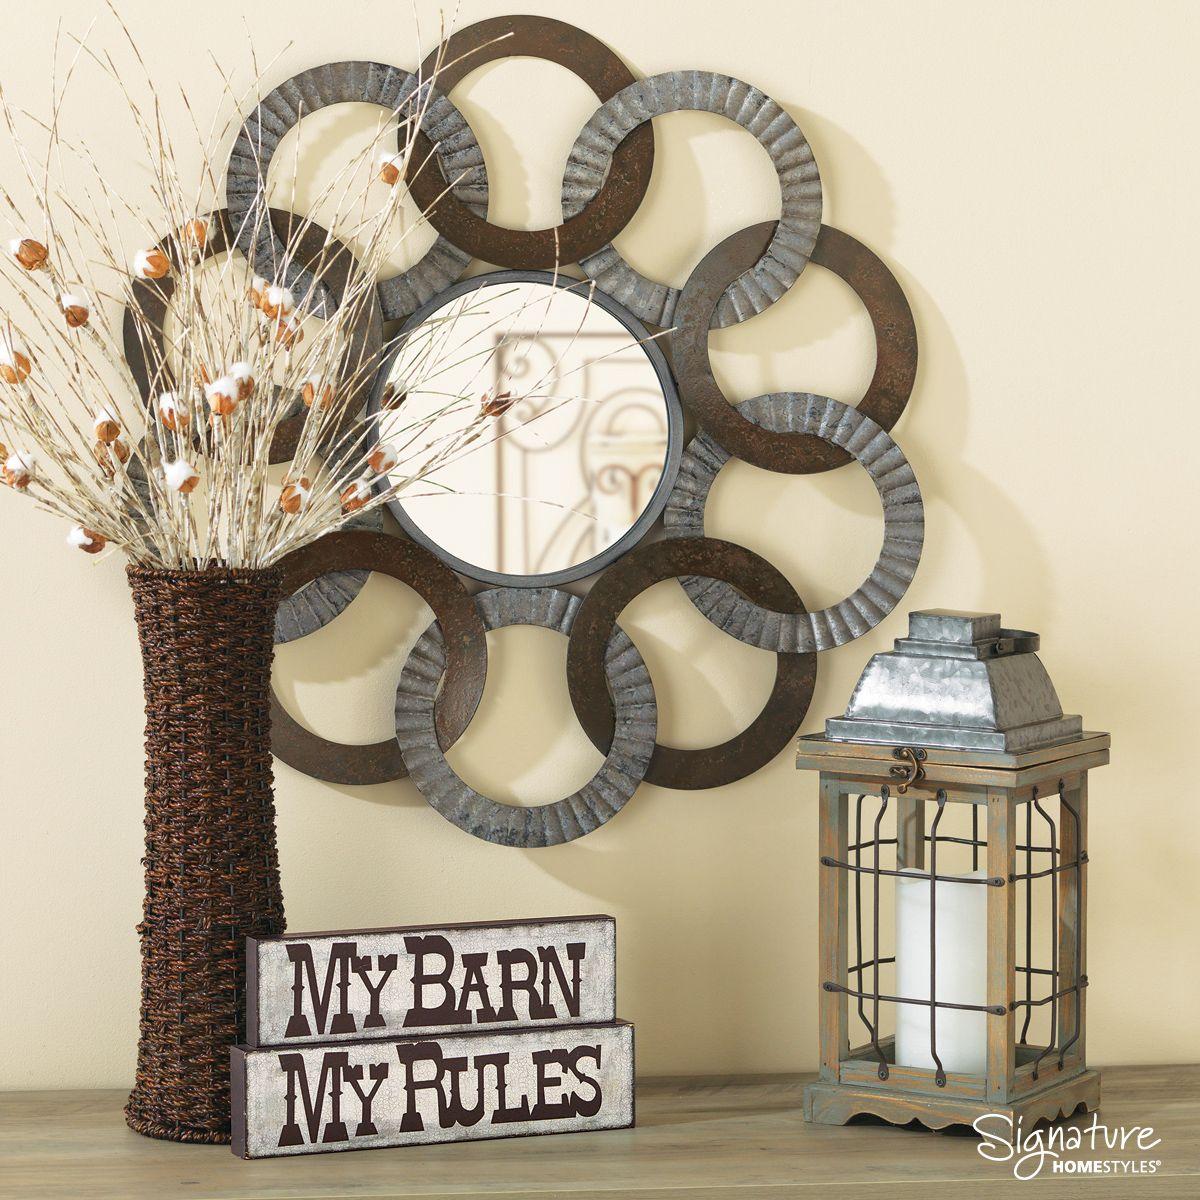 My Barn, My Rules! NEW Vintage Famhouse Home Décor, Barn House Wall Décor,  Home Organization, LED Candles, Horse Prints, Lanterns, Vases, Storage, ...